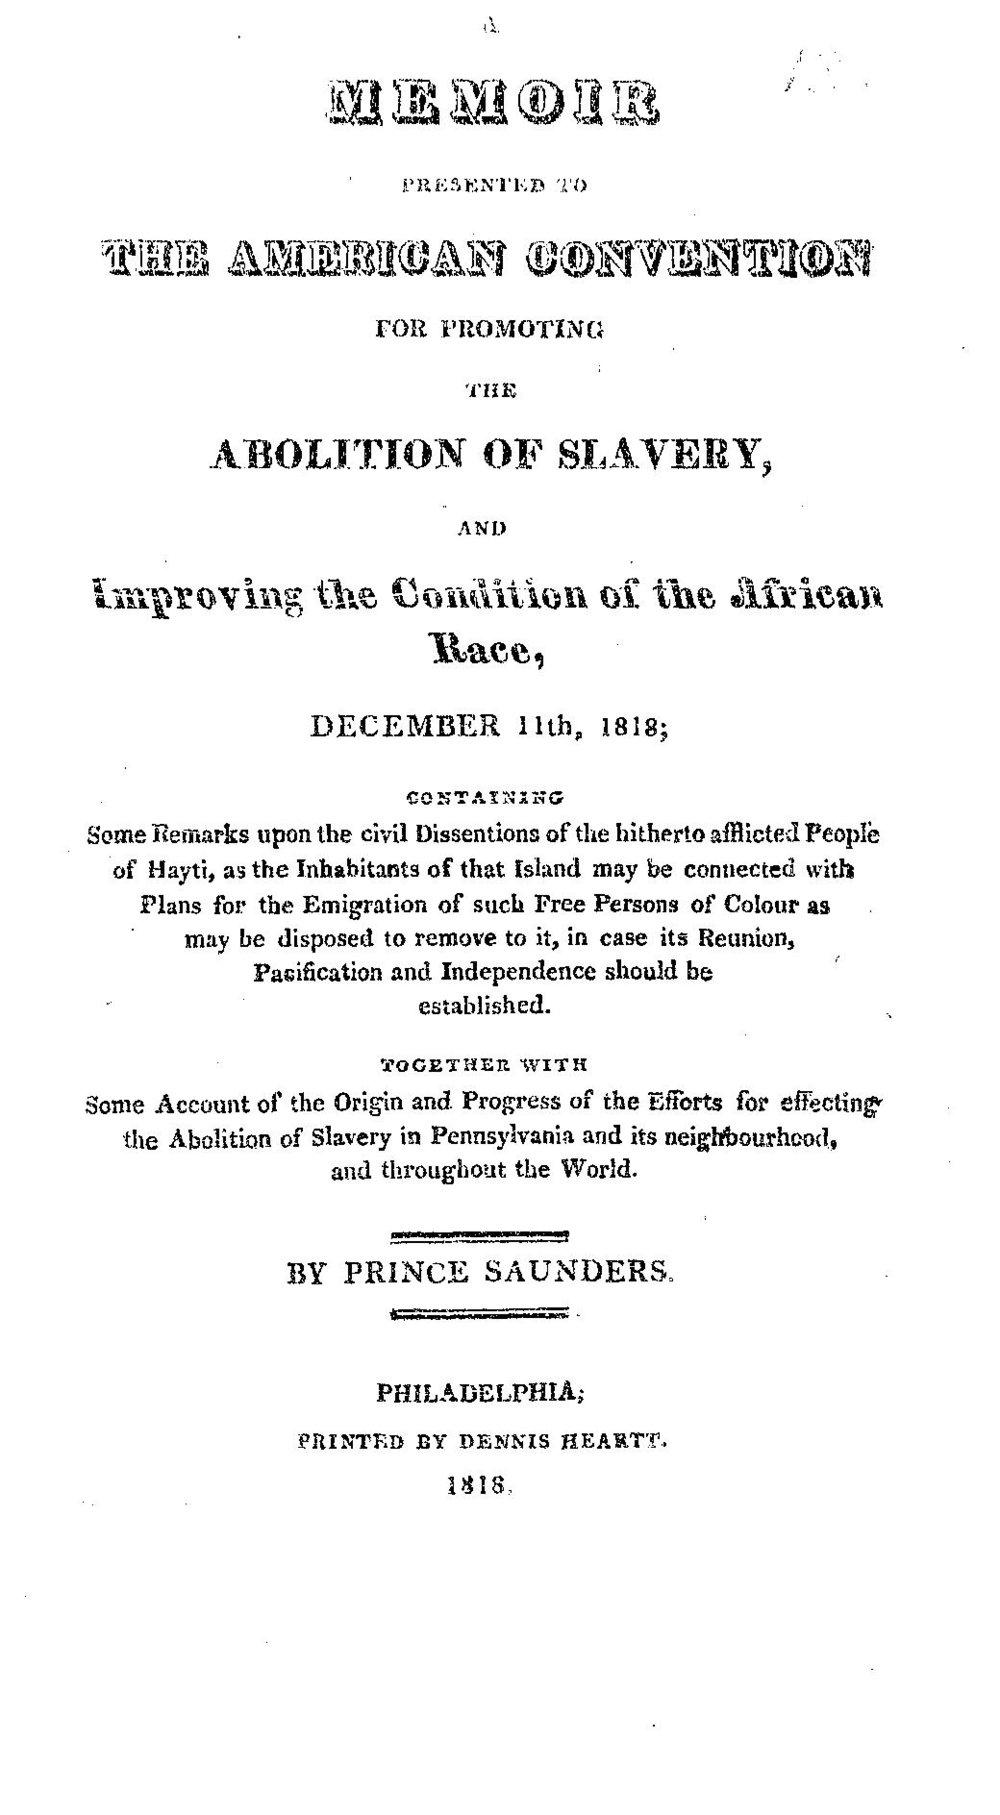 Saunders Memoir on Haiti 1818.jpg